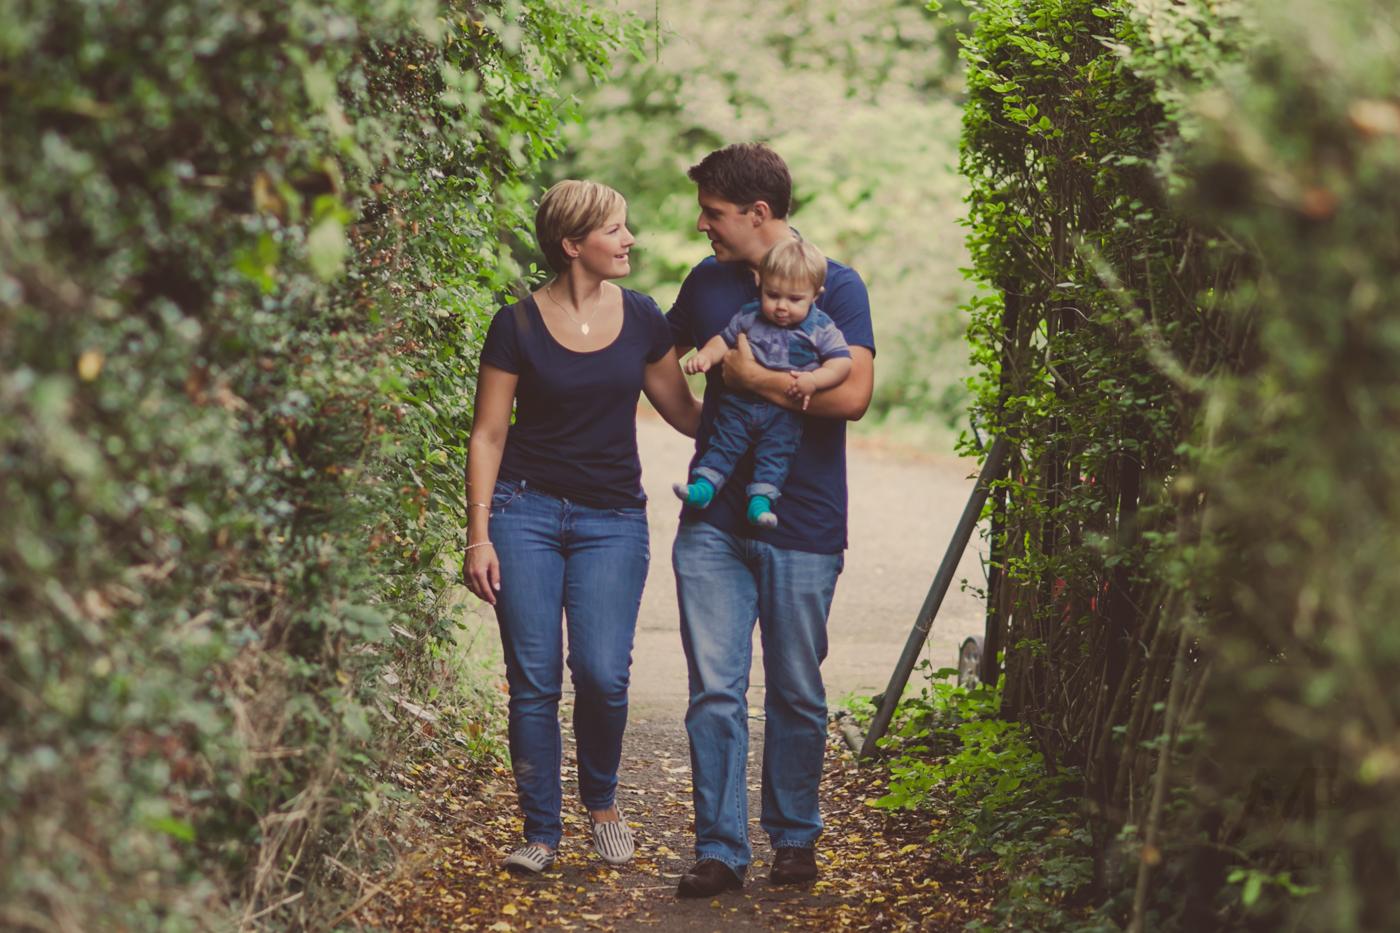 019 - Kelly, Matthew and Hugo Fine Art Family Photography by www.mpmedia.co.uk -107.JPG